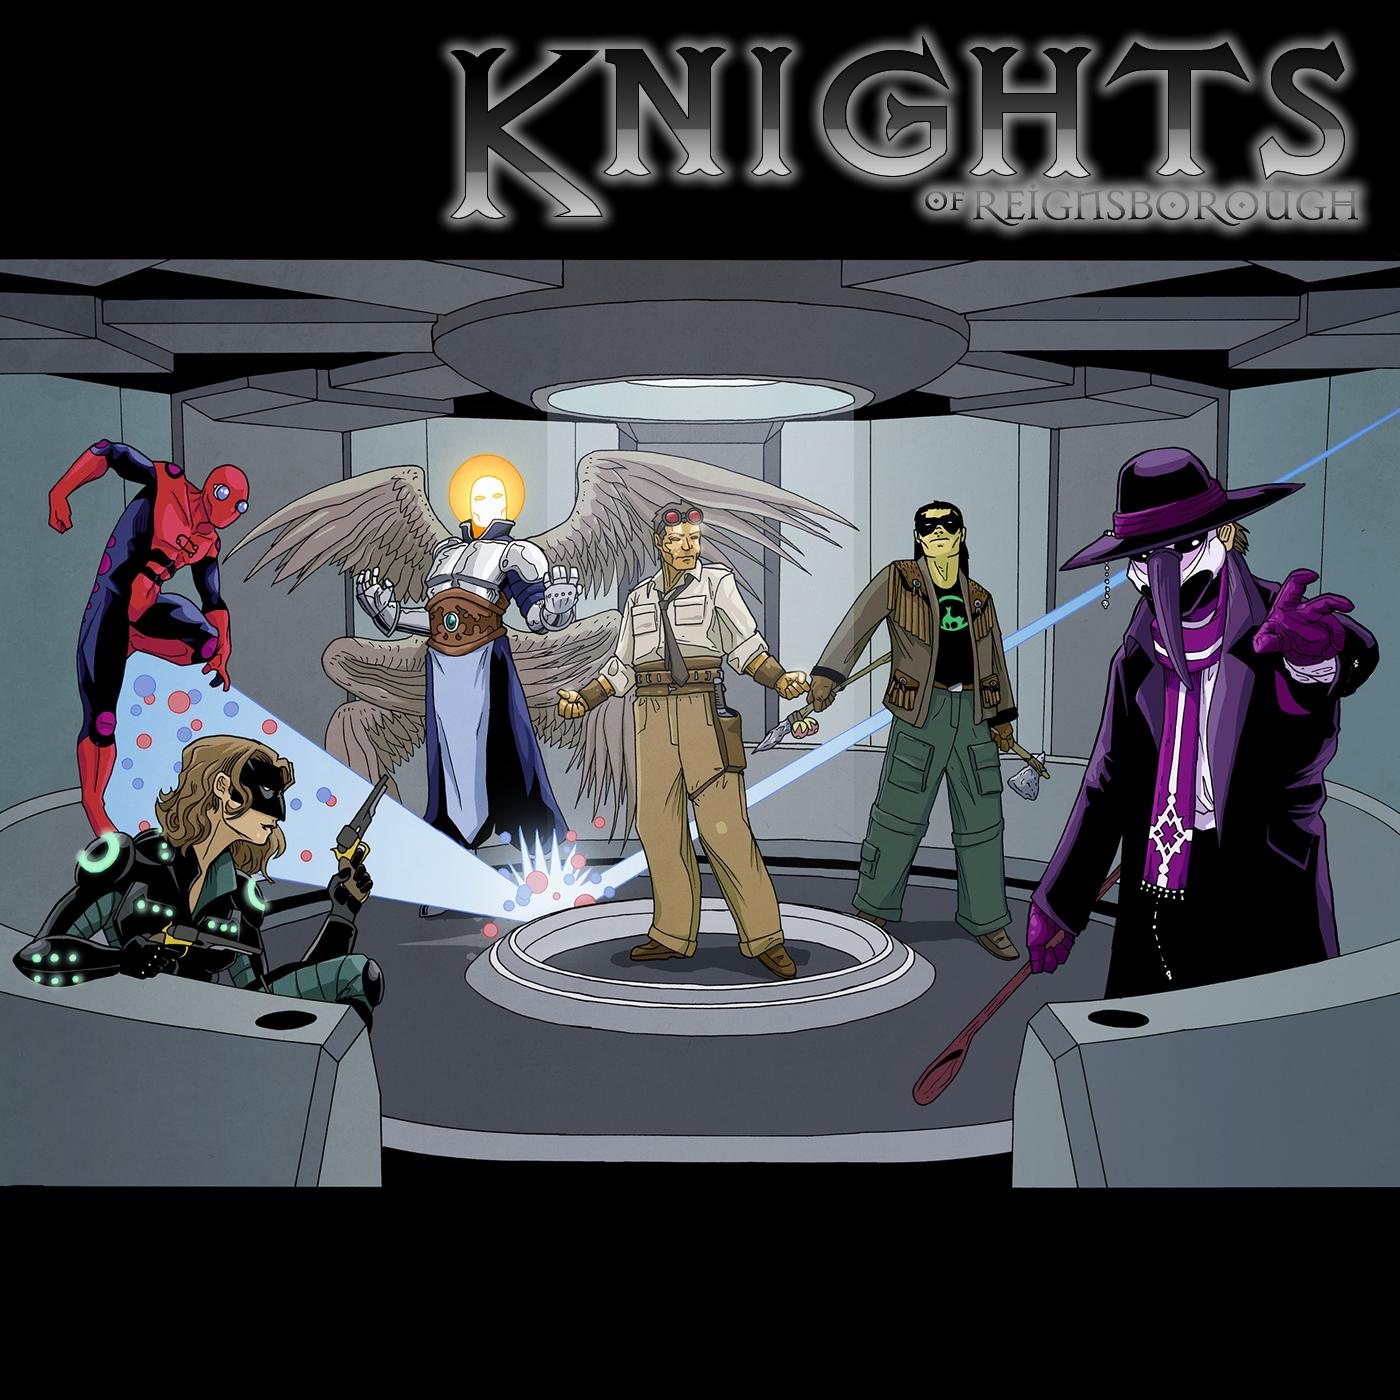 Episodes – Knights of Reignsborough